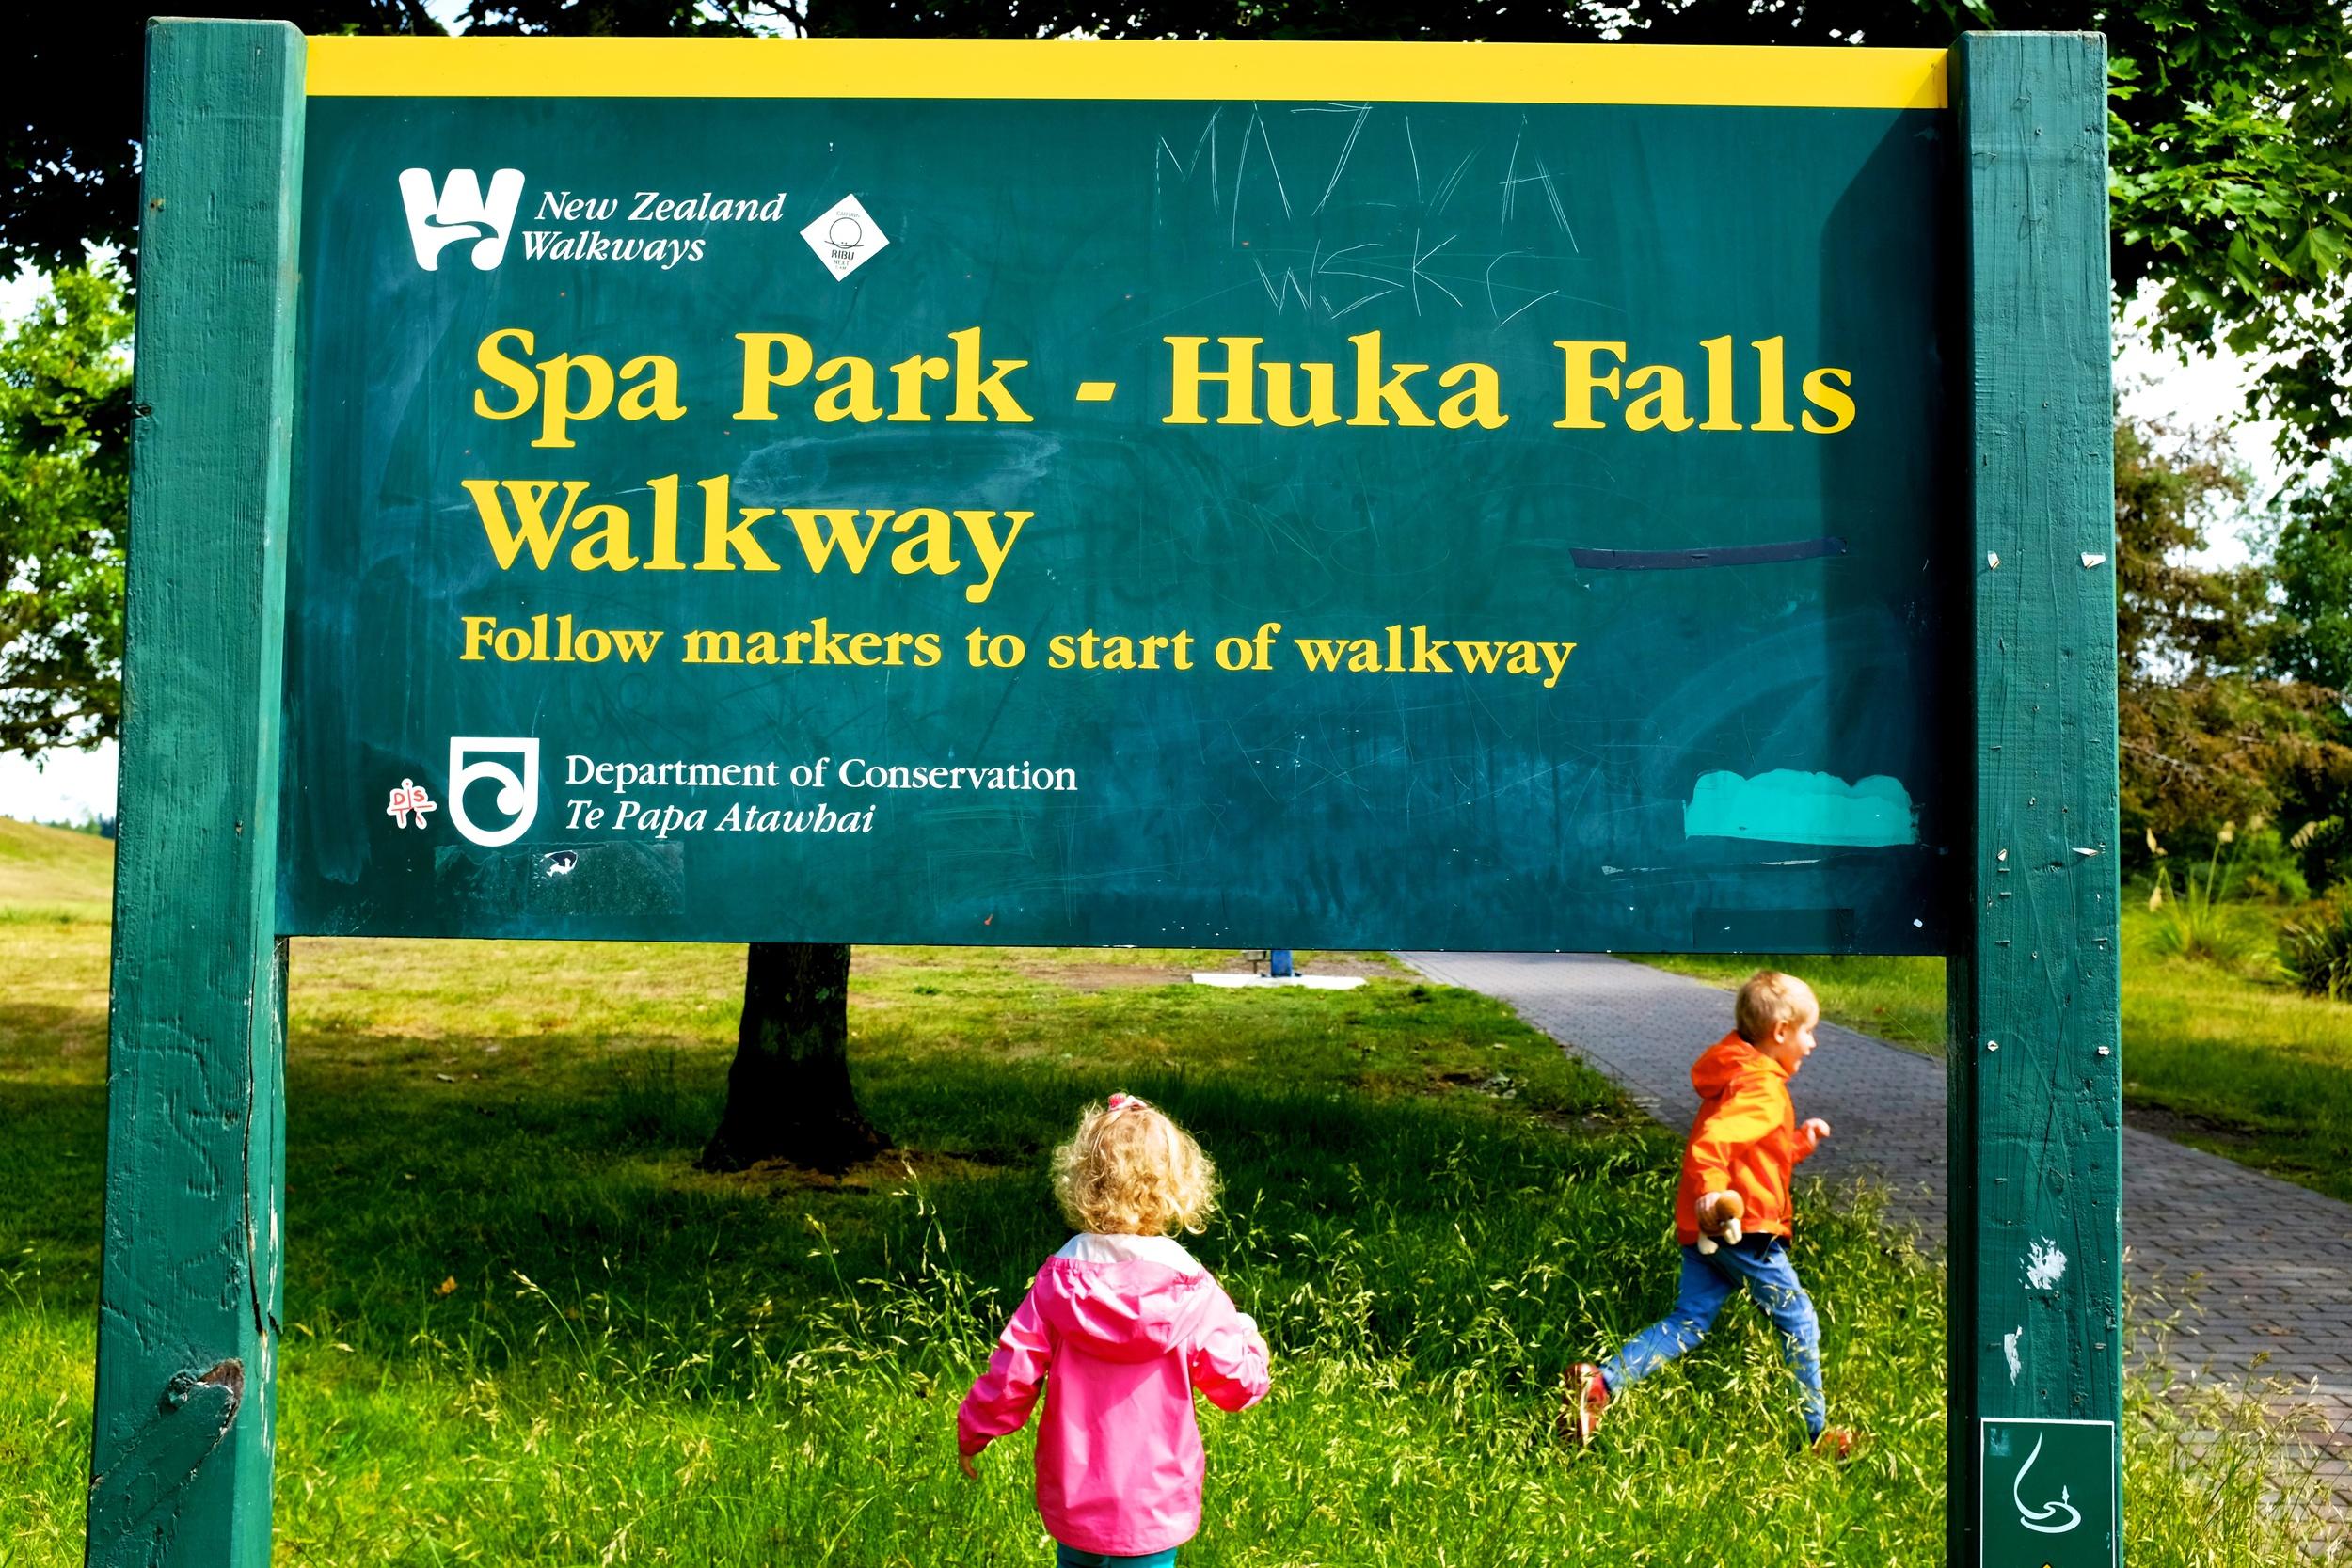 Spa Park - Huka Falls Walkway